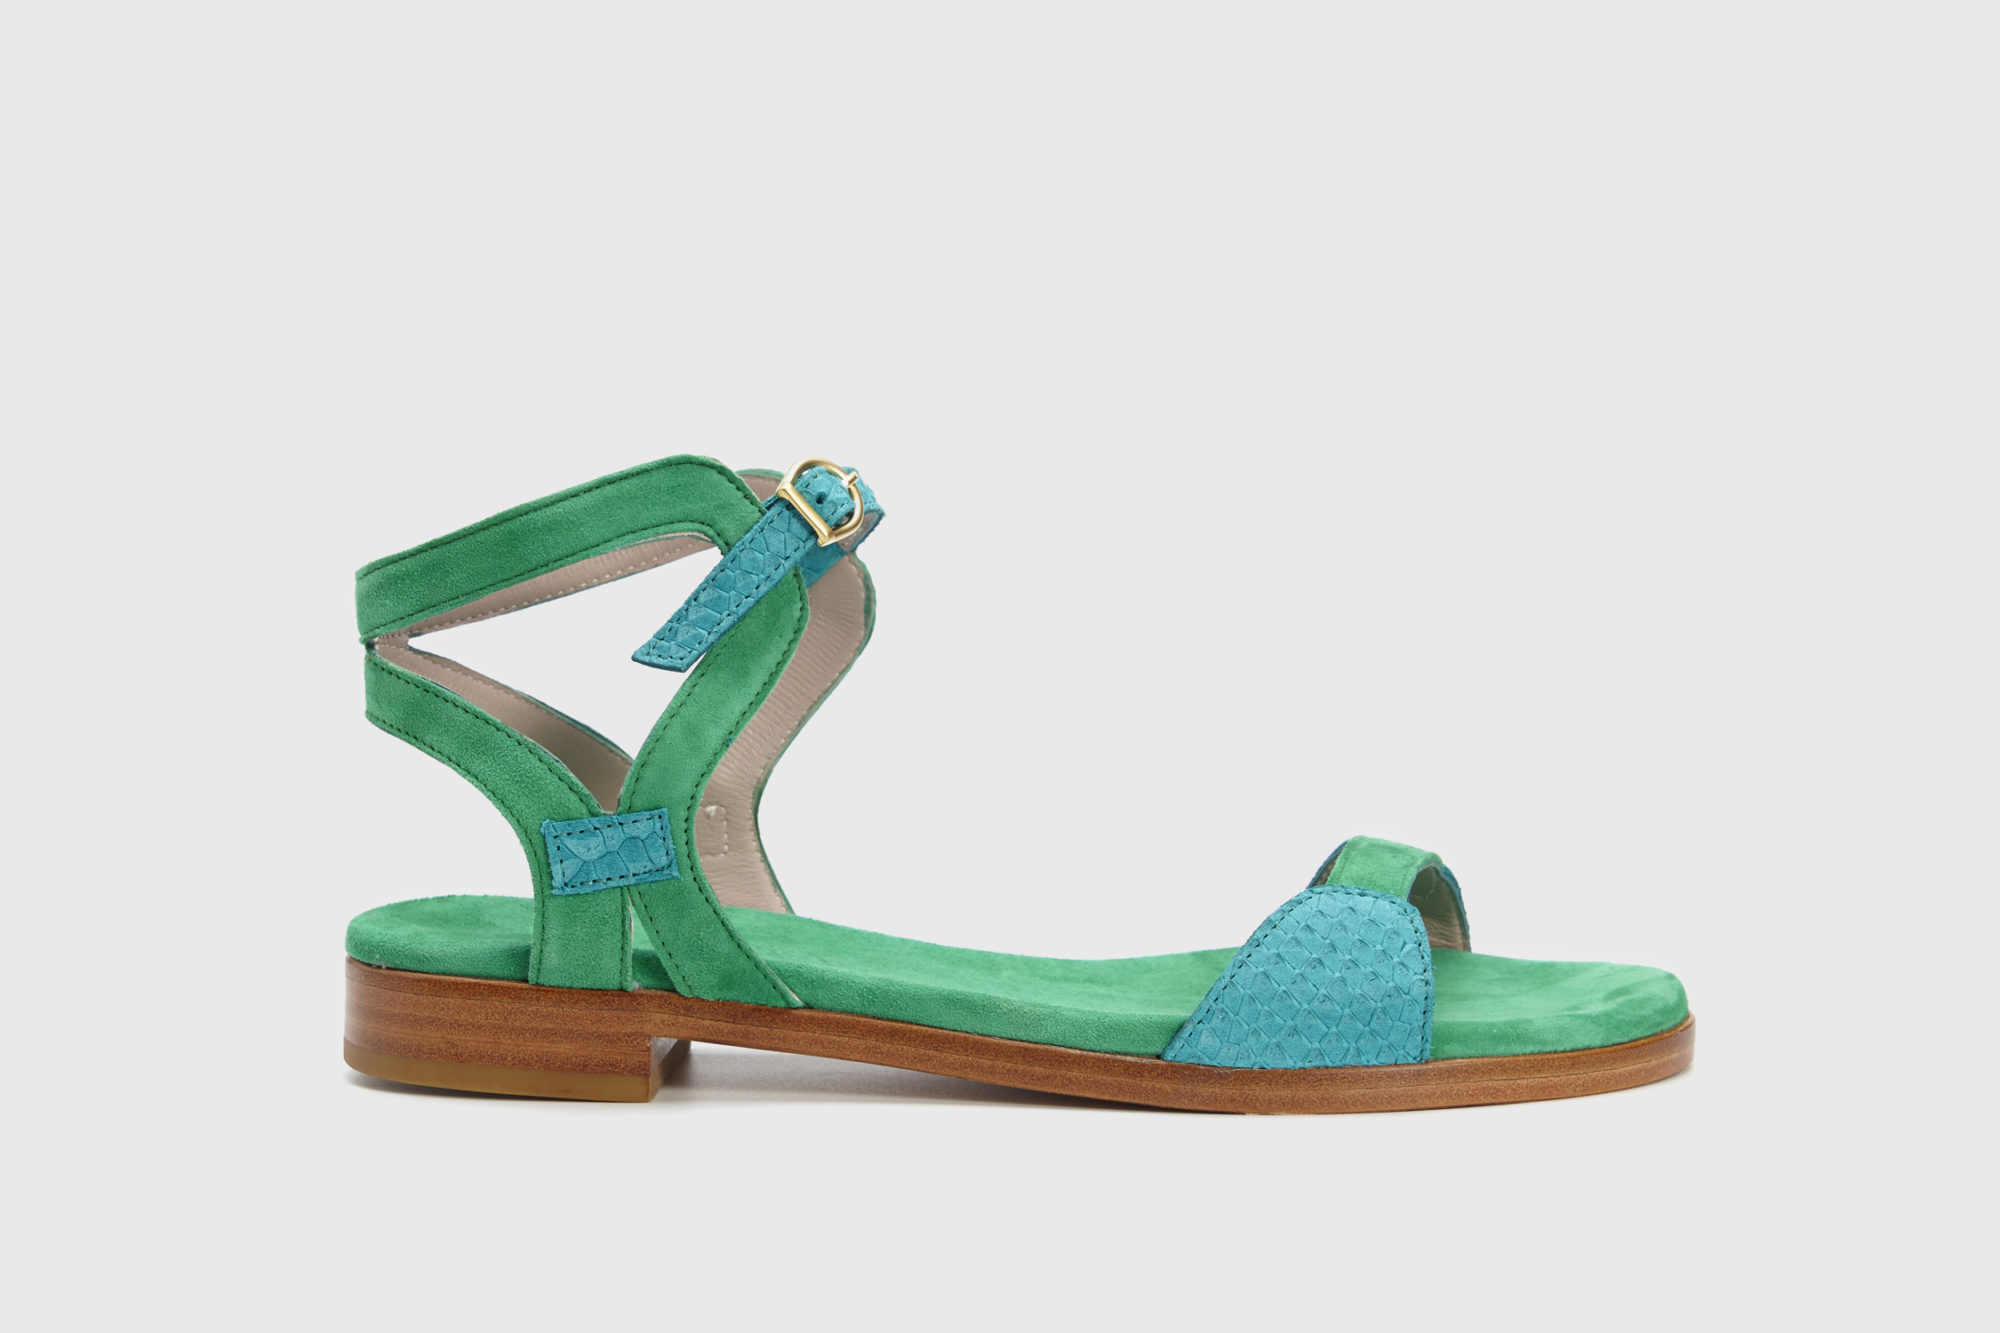 Dorotea sandalia plana Maya turquesa verde ss18 perfil